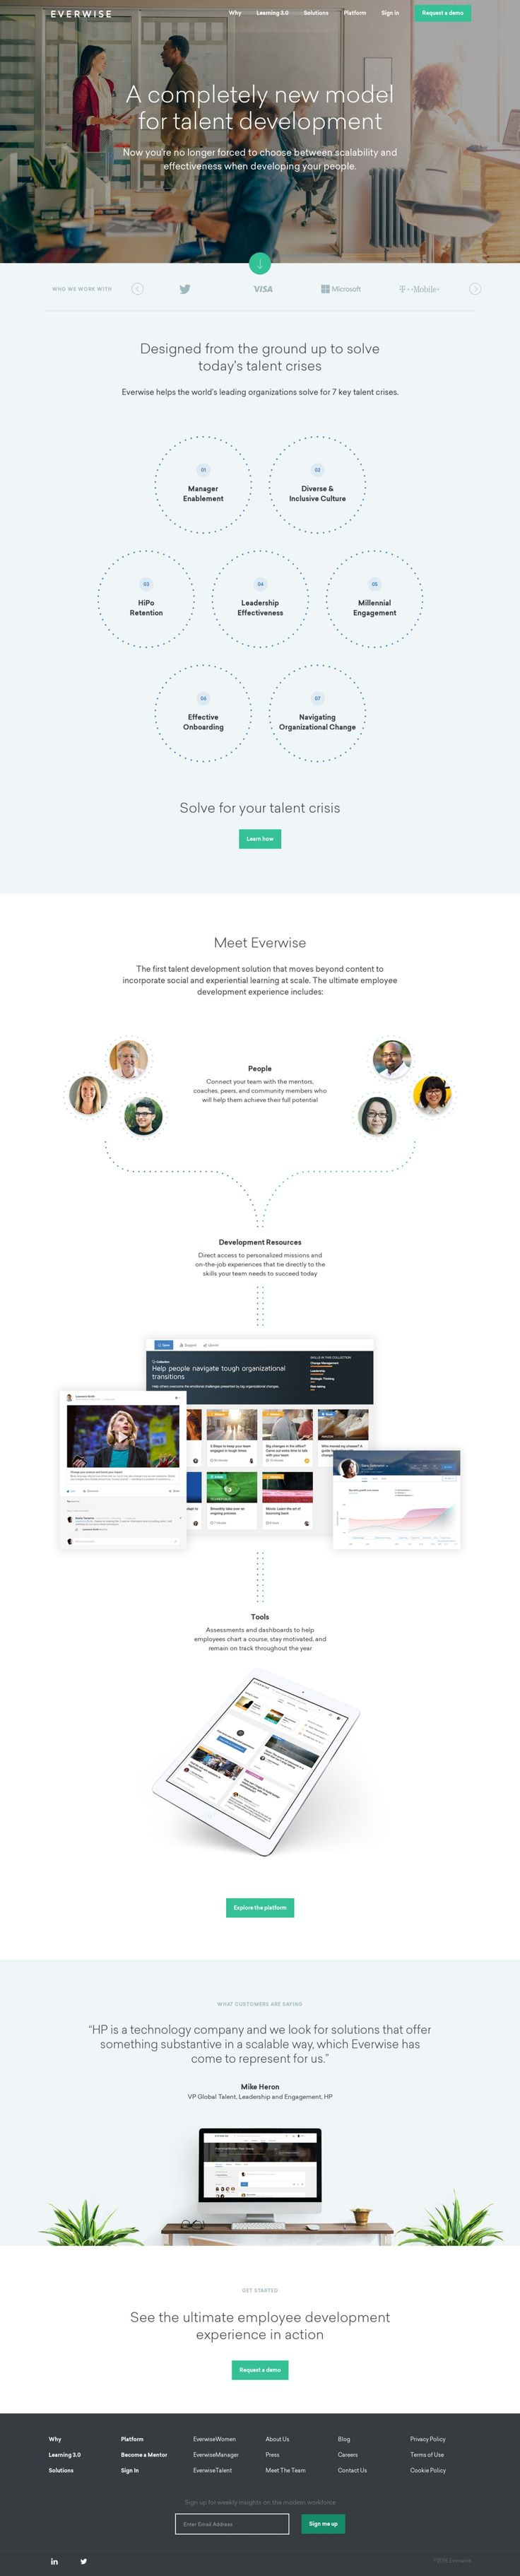 Everwise Enterprise Social Learning Platform